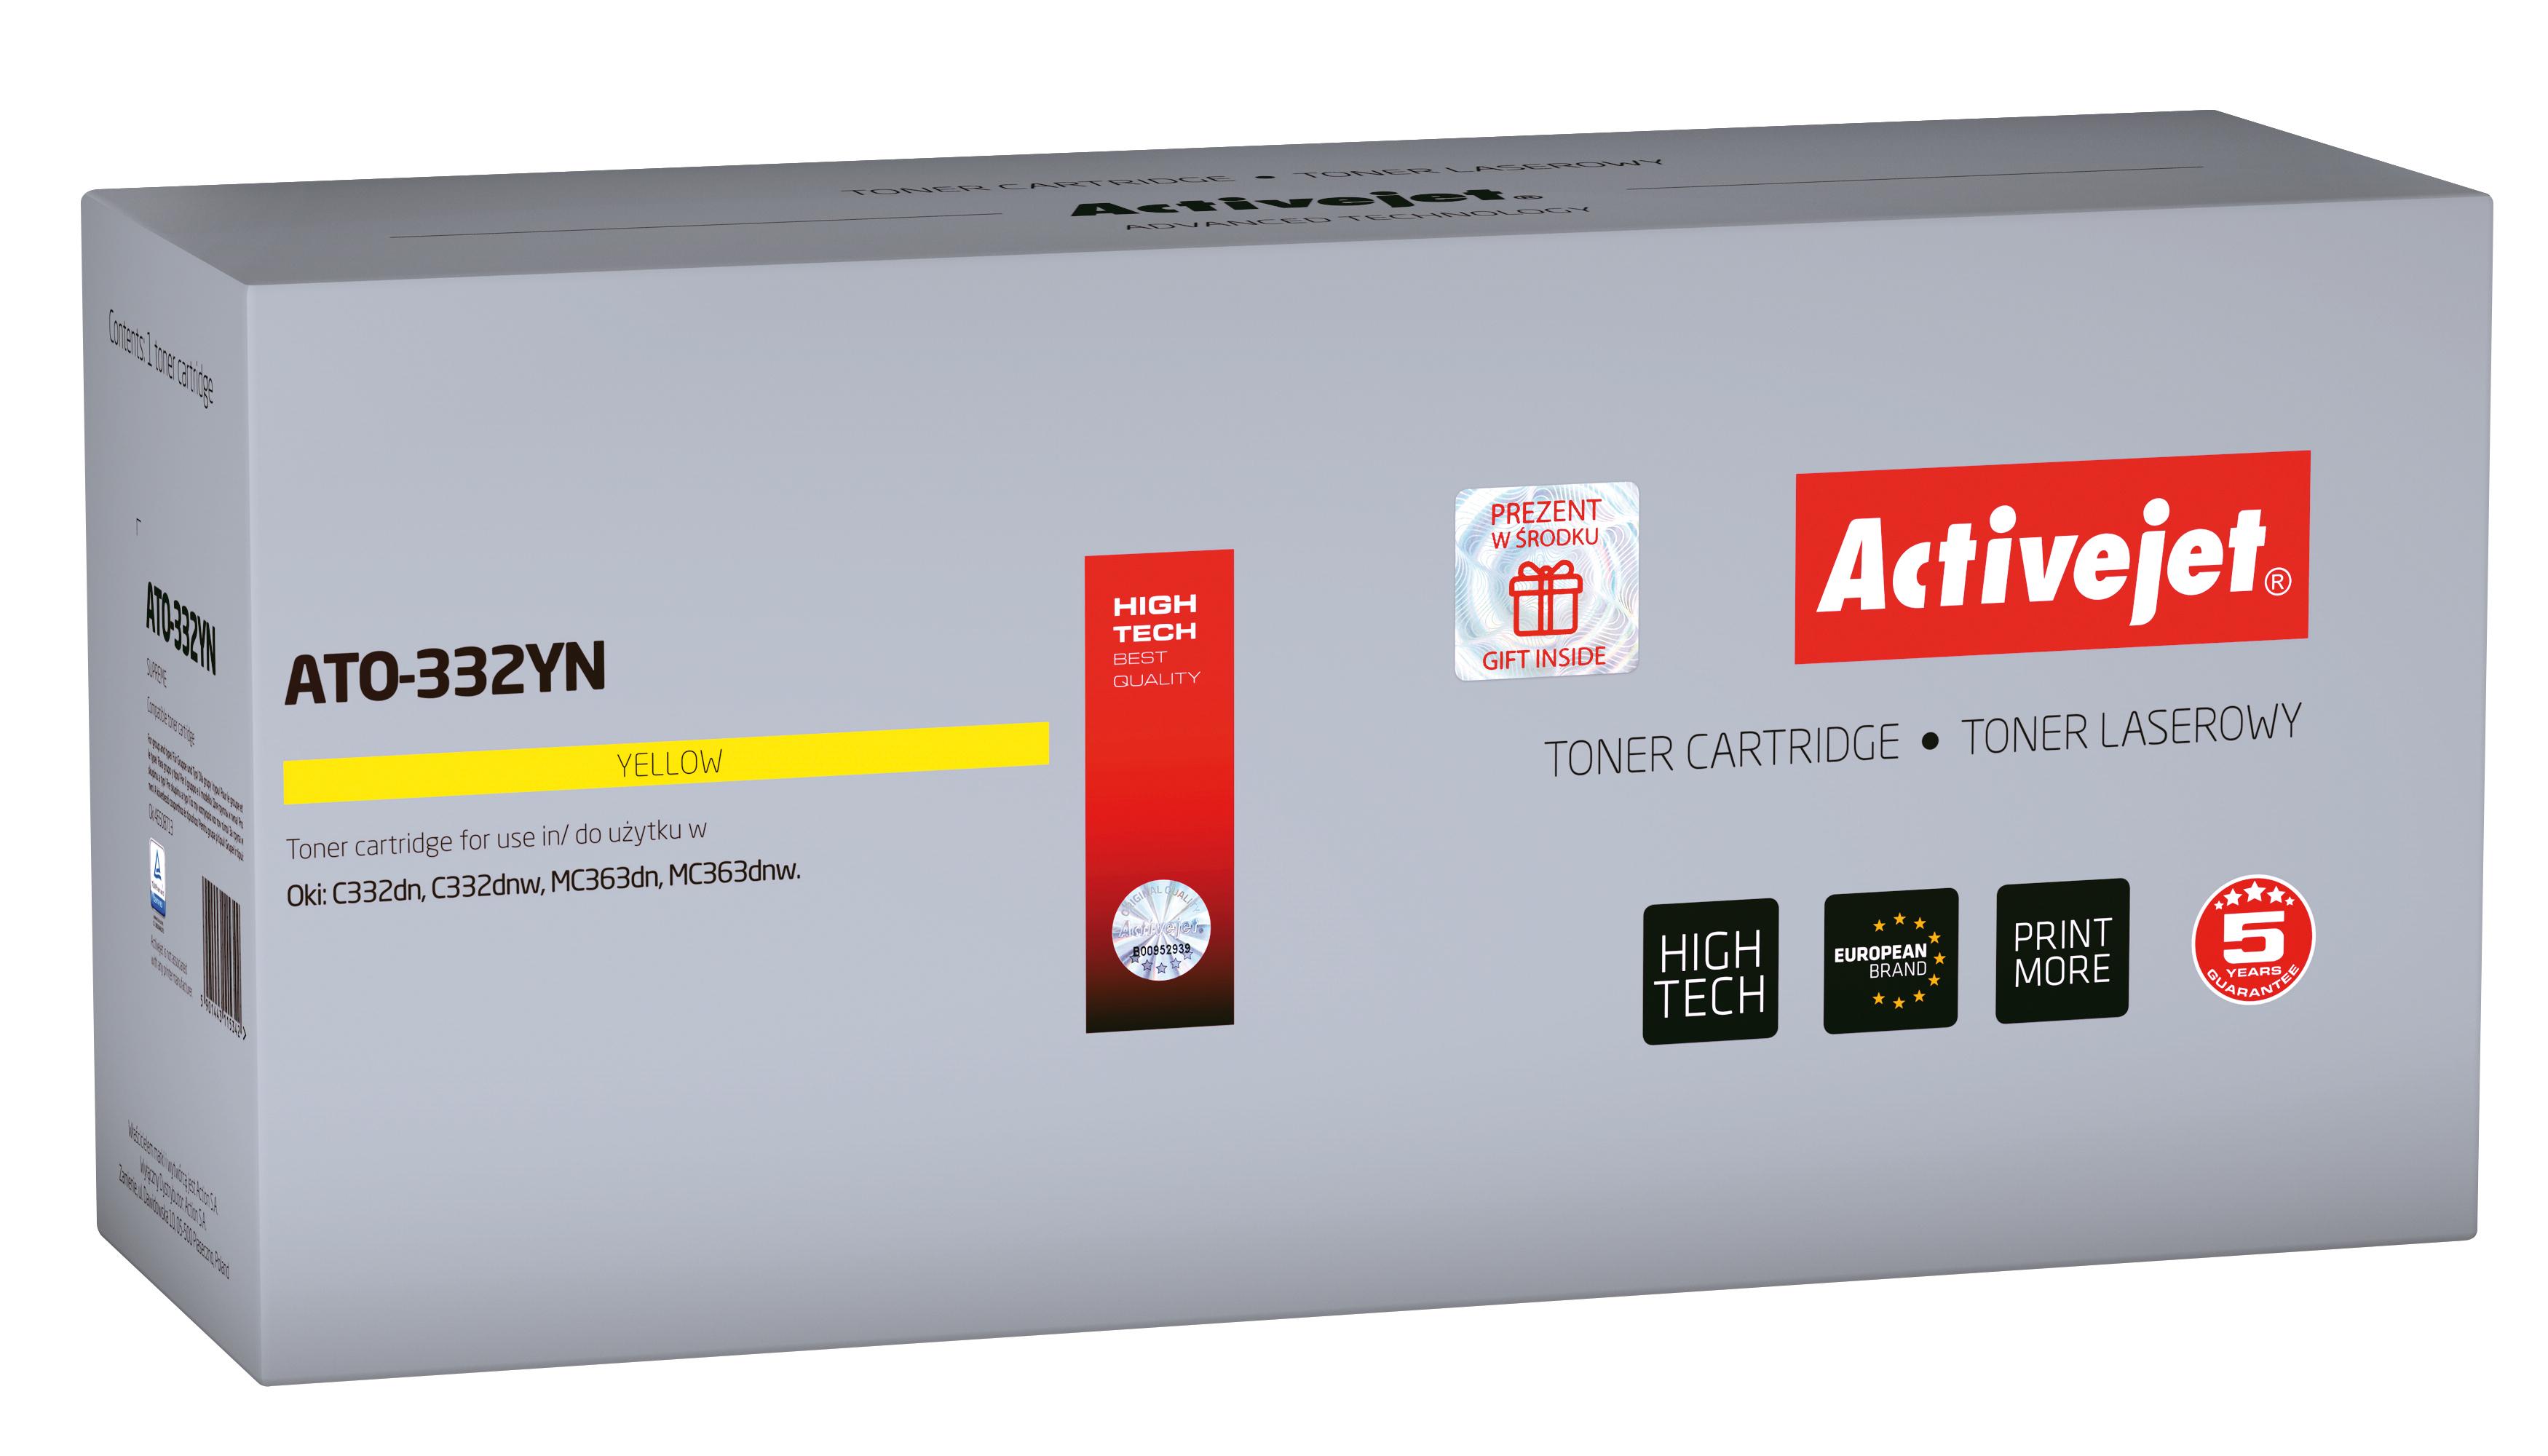 Toner Activejet  ATO-332YN do drukarki OKI, Zamiennik OKI 46508713; Supreme; 1500 stron; Żólty.